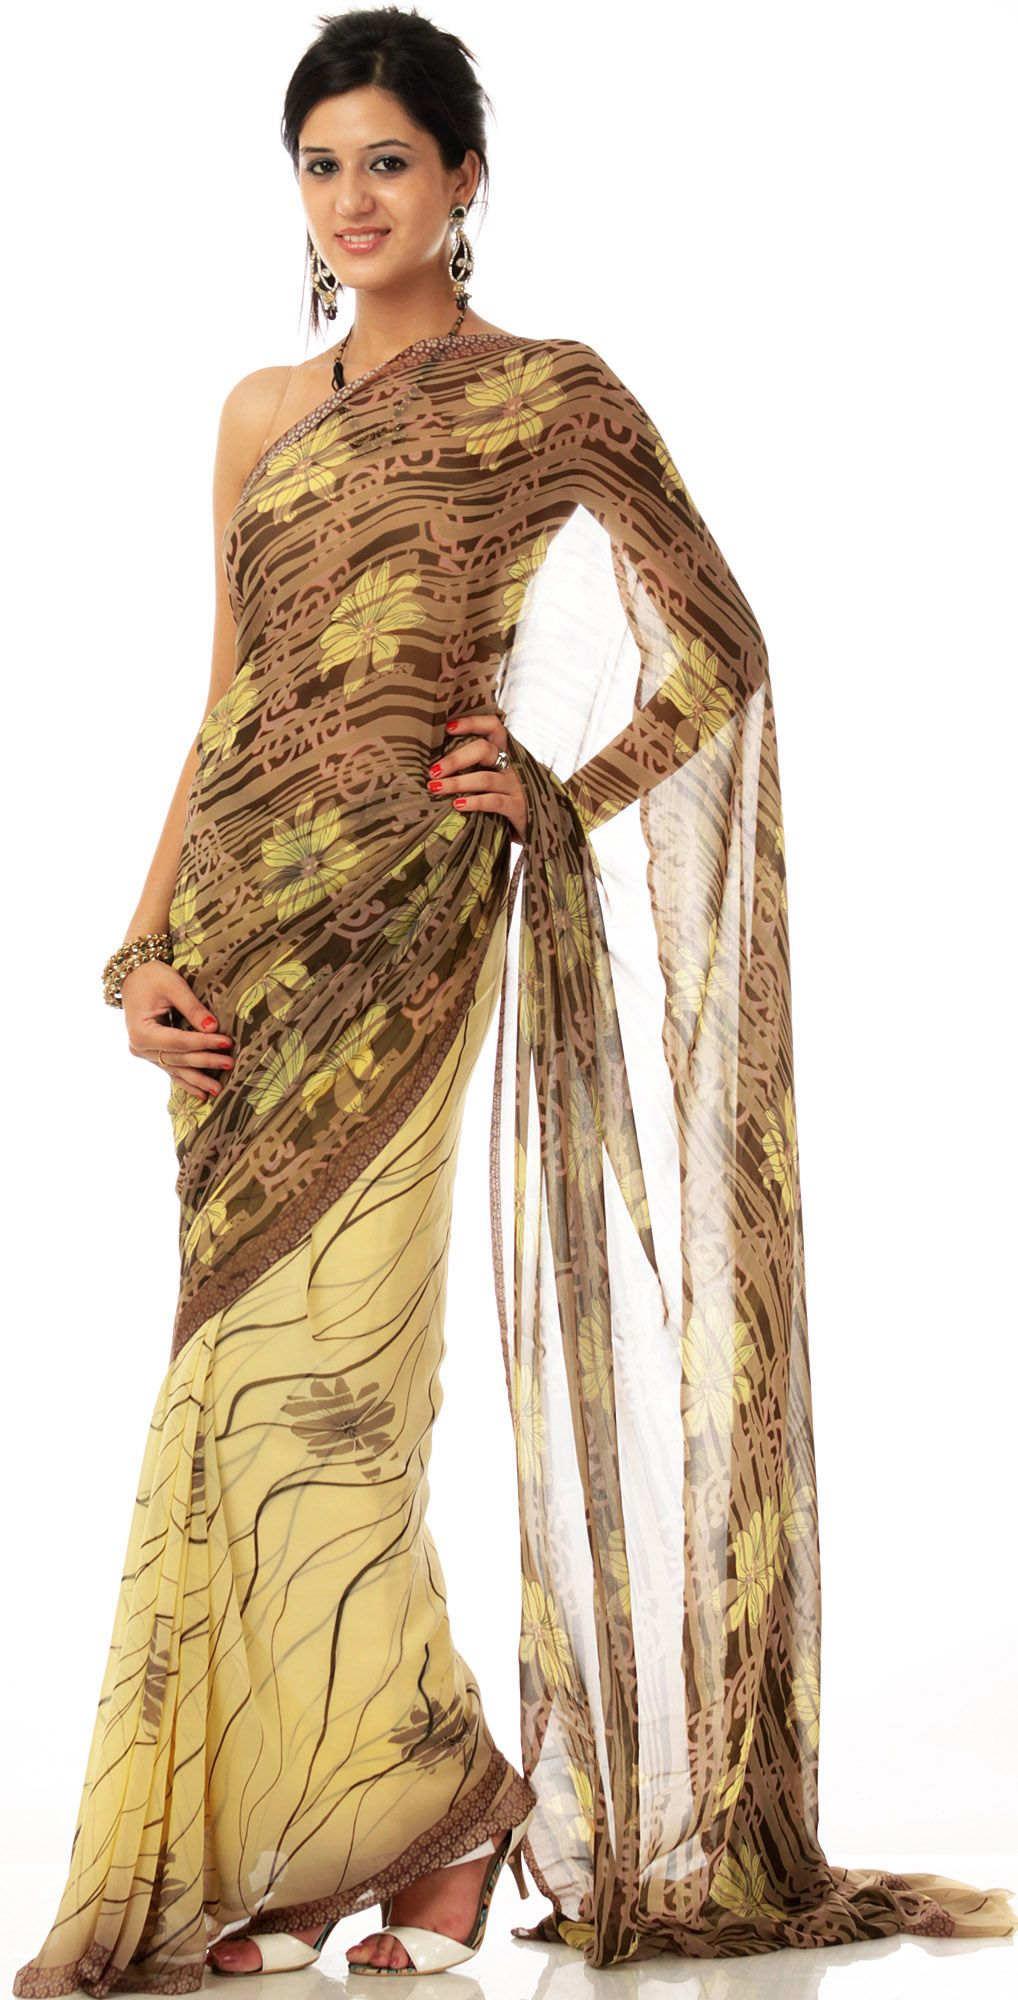 Modern Sari Google Search Ethnic Fashion Pinterest Saris Pakistani Clothing And Ethnic